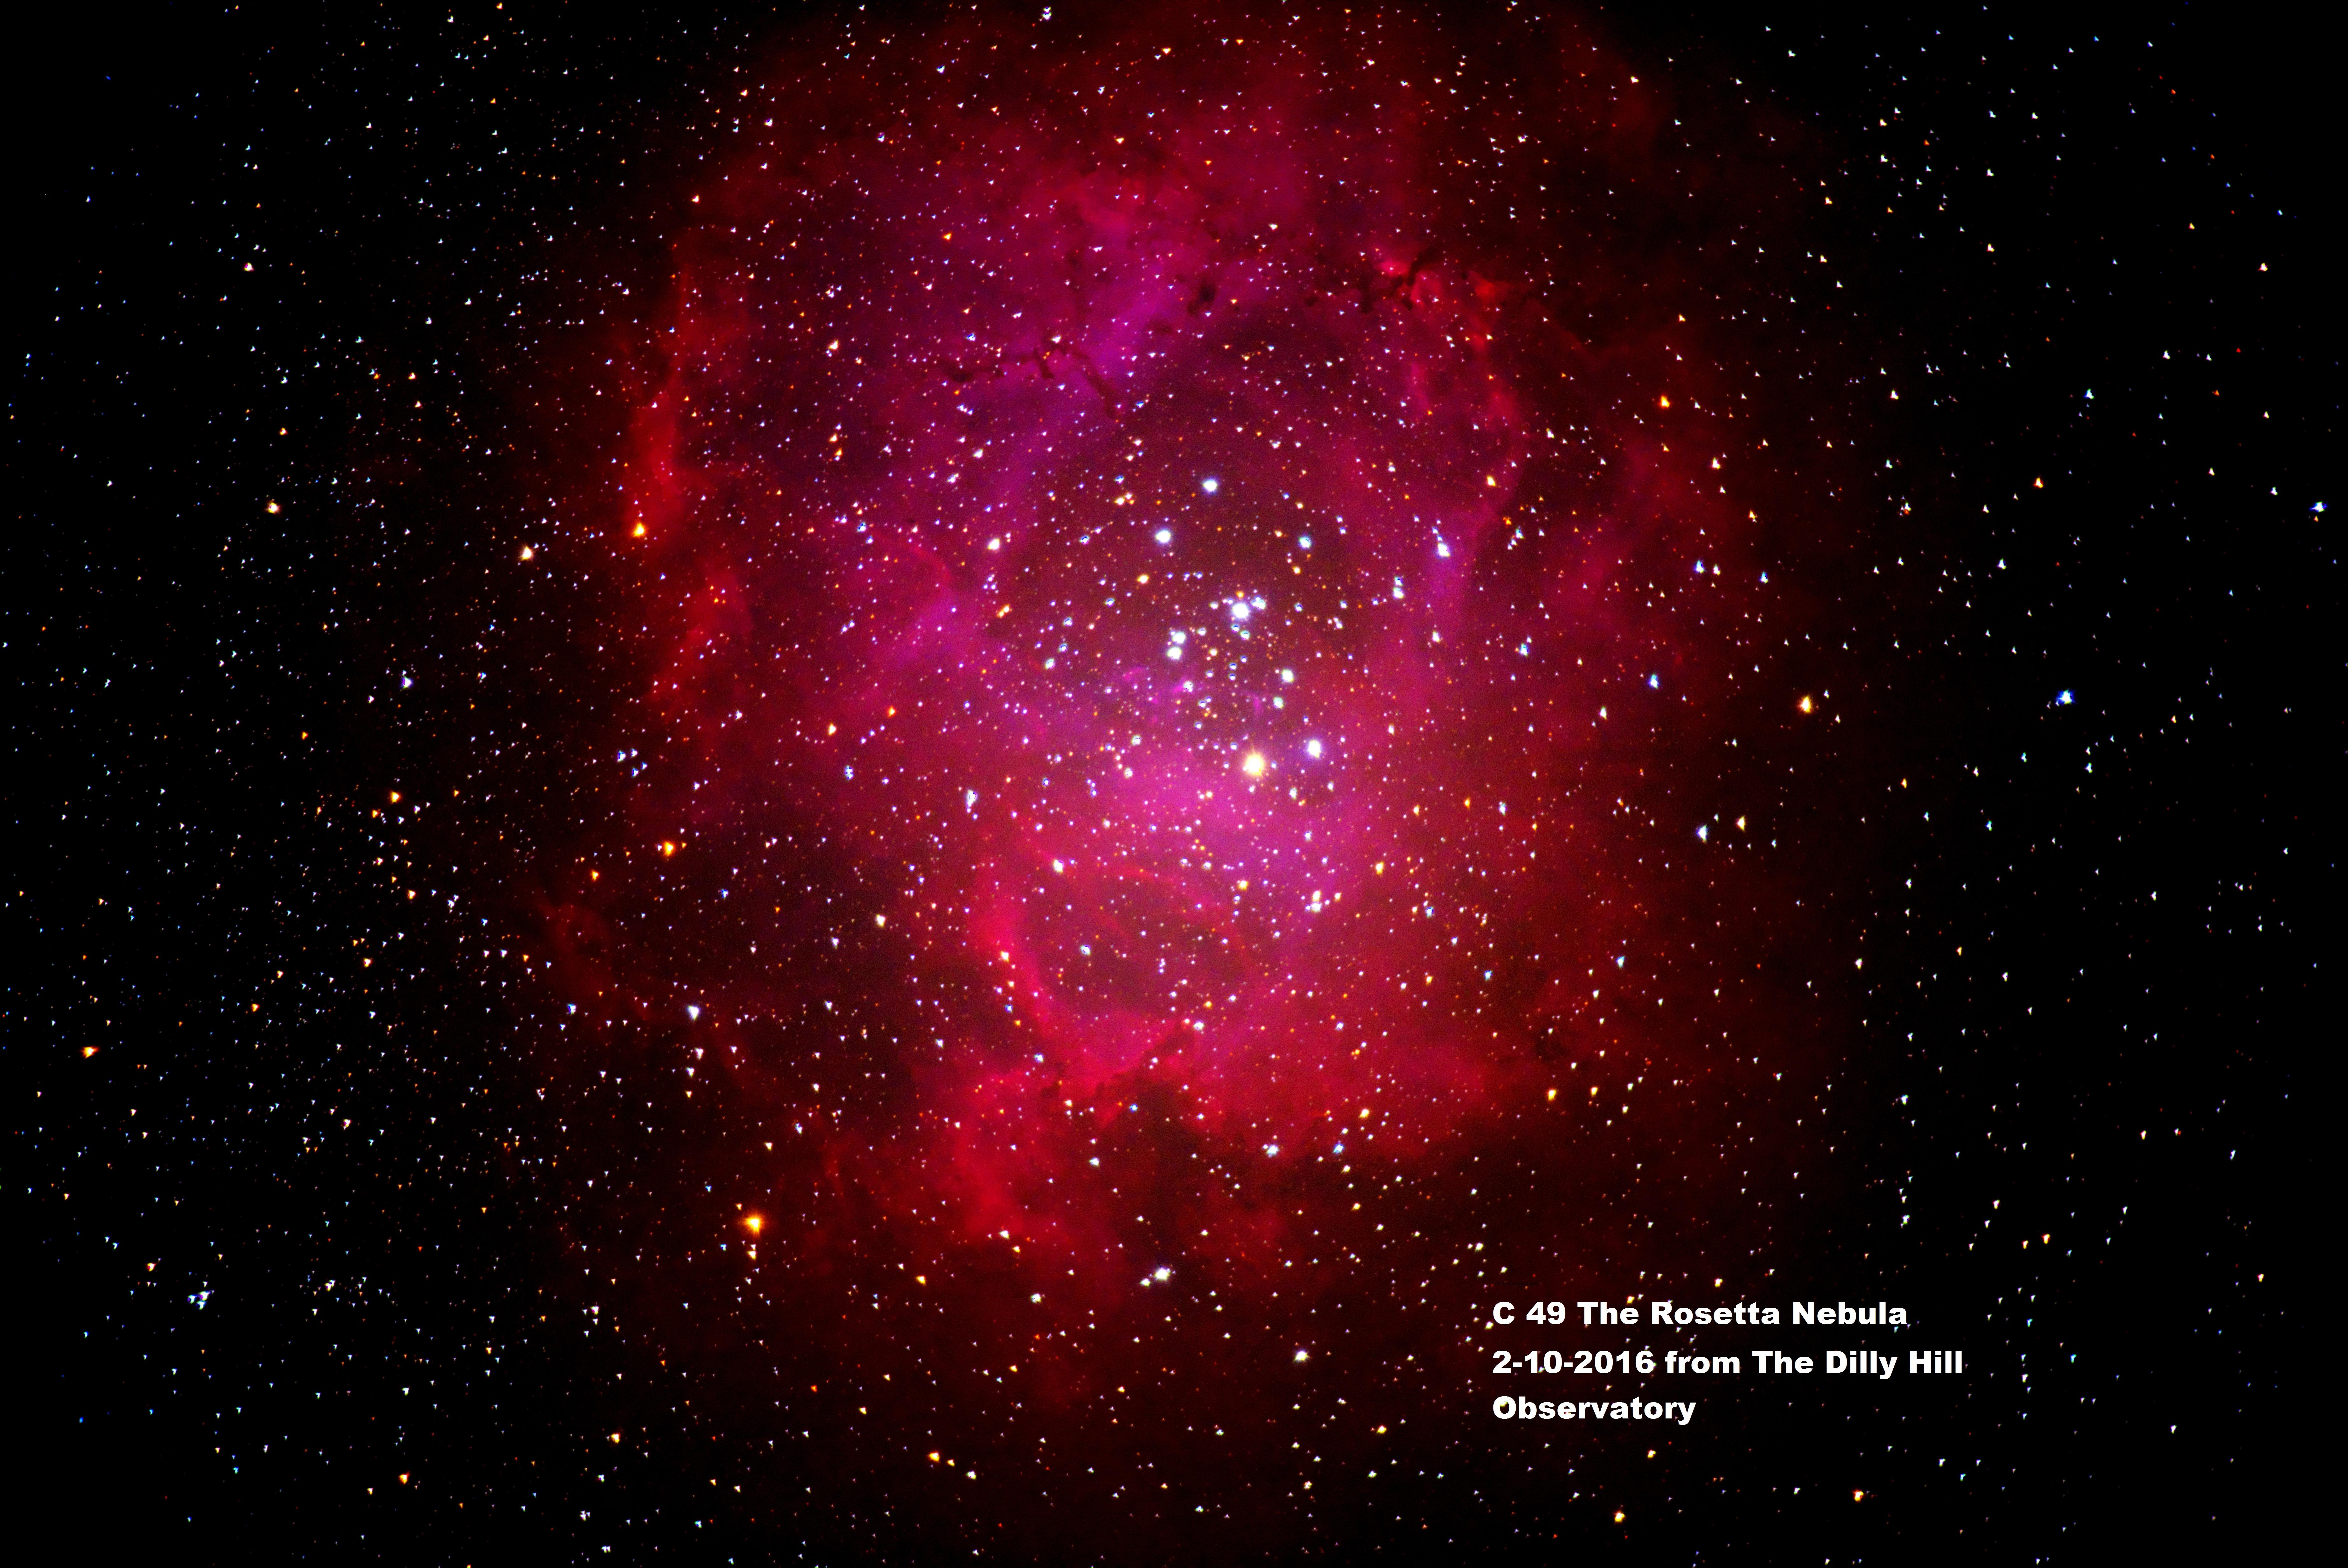 Rosetta Nebula 2-10-2016